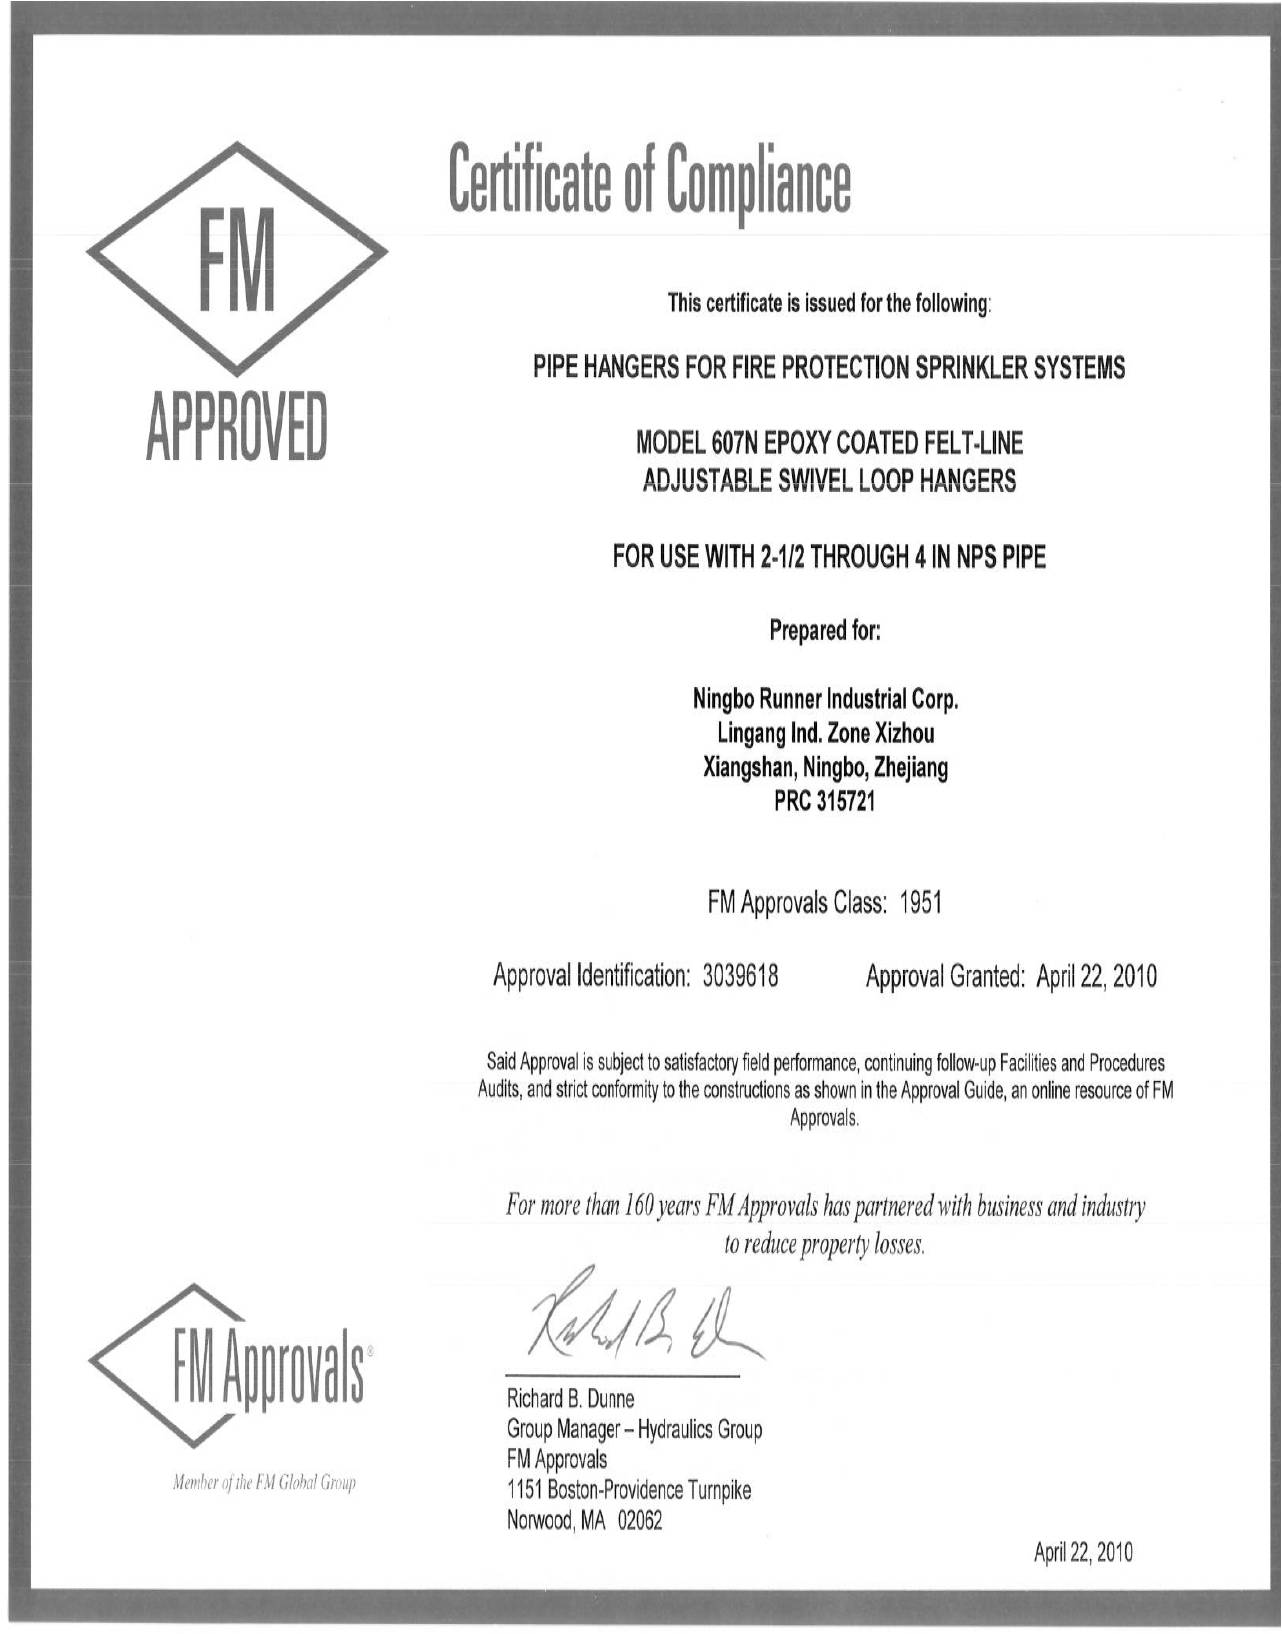 fm certificate approval ningbo corp runner industrial swivel epoxy certificated coated hangers lined loop felt adjustable apr